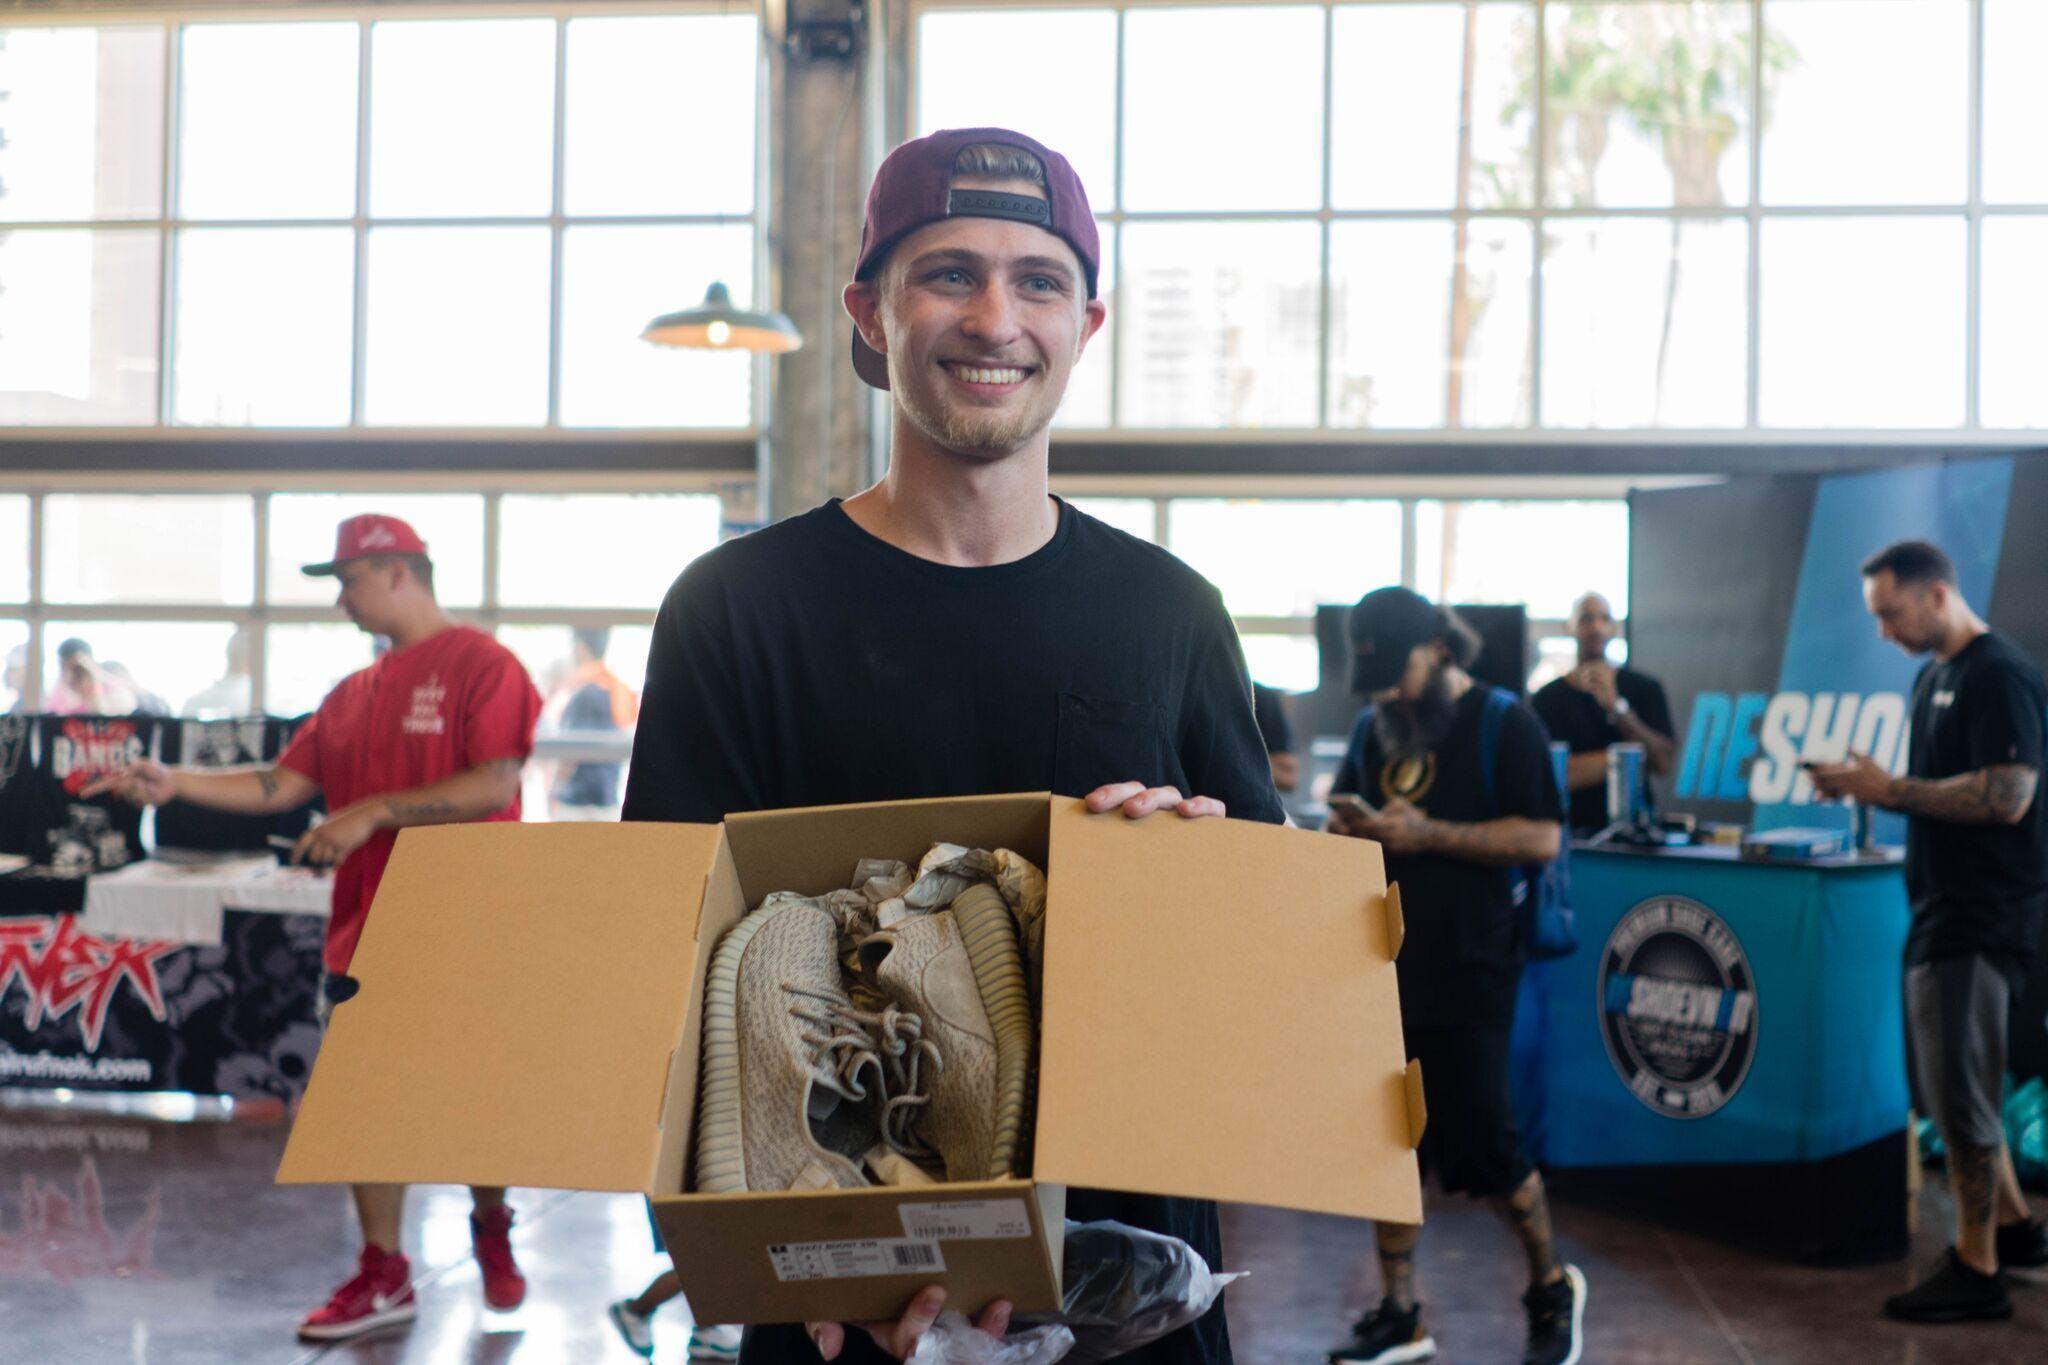 BHT Fest Arizona (Sneaker/Clothing/Barber/Art Convention)